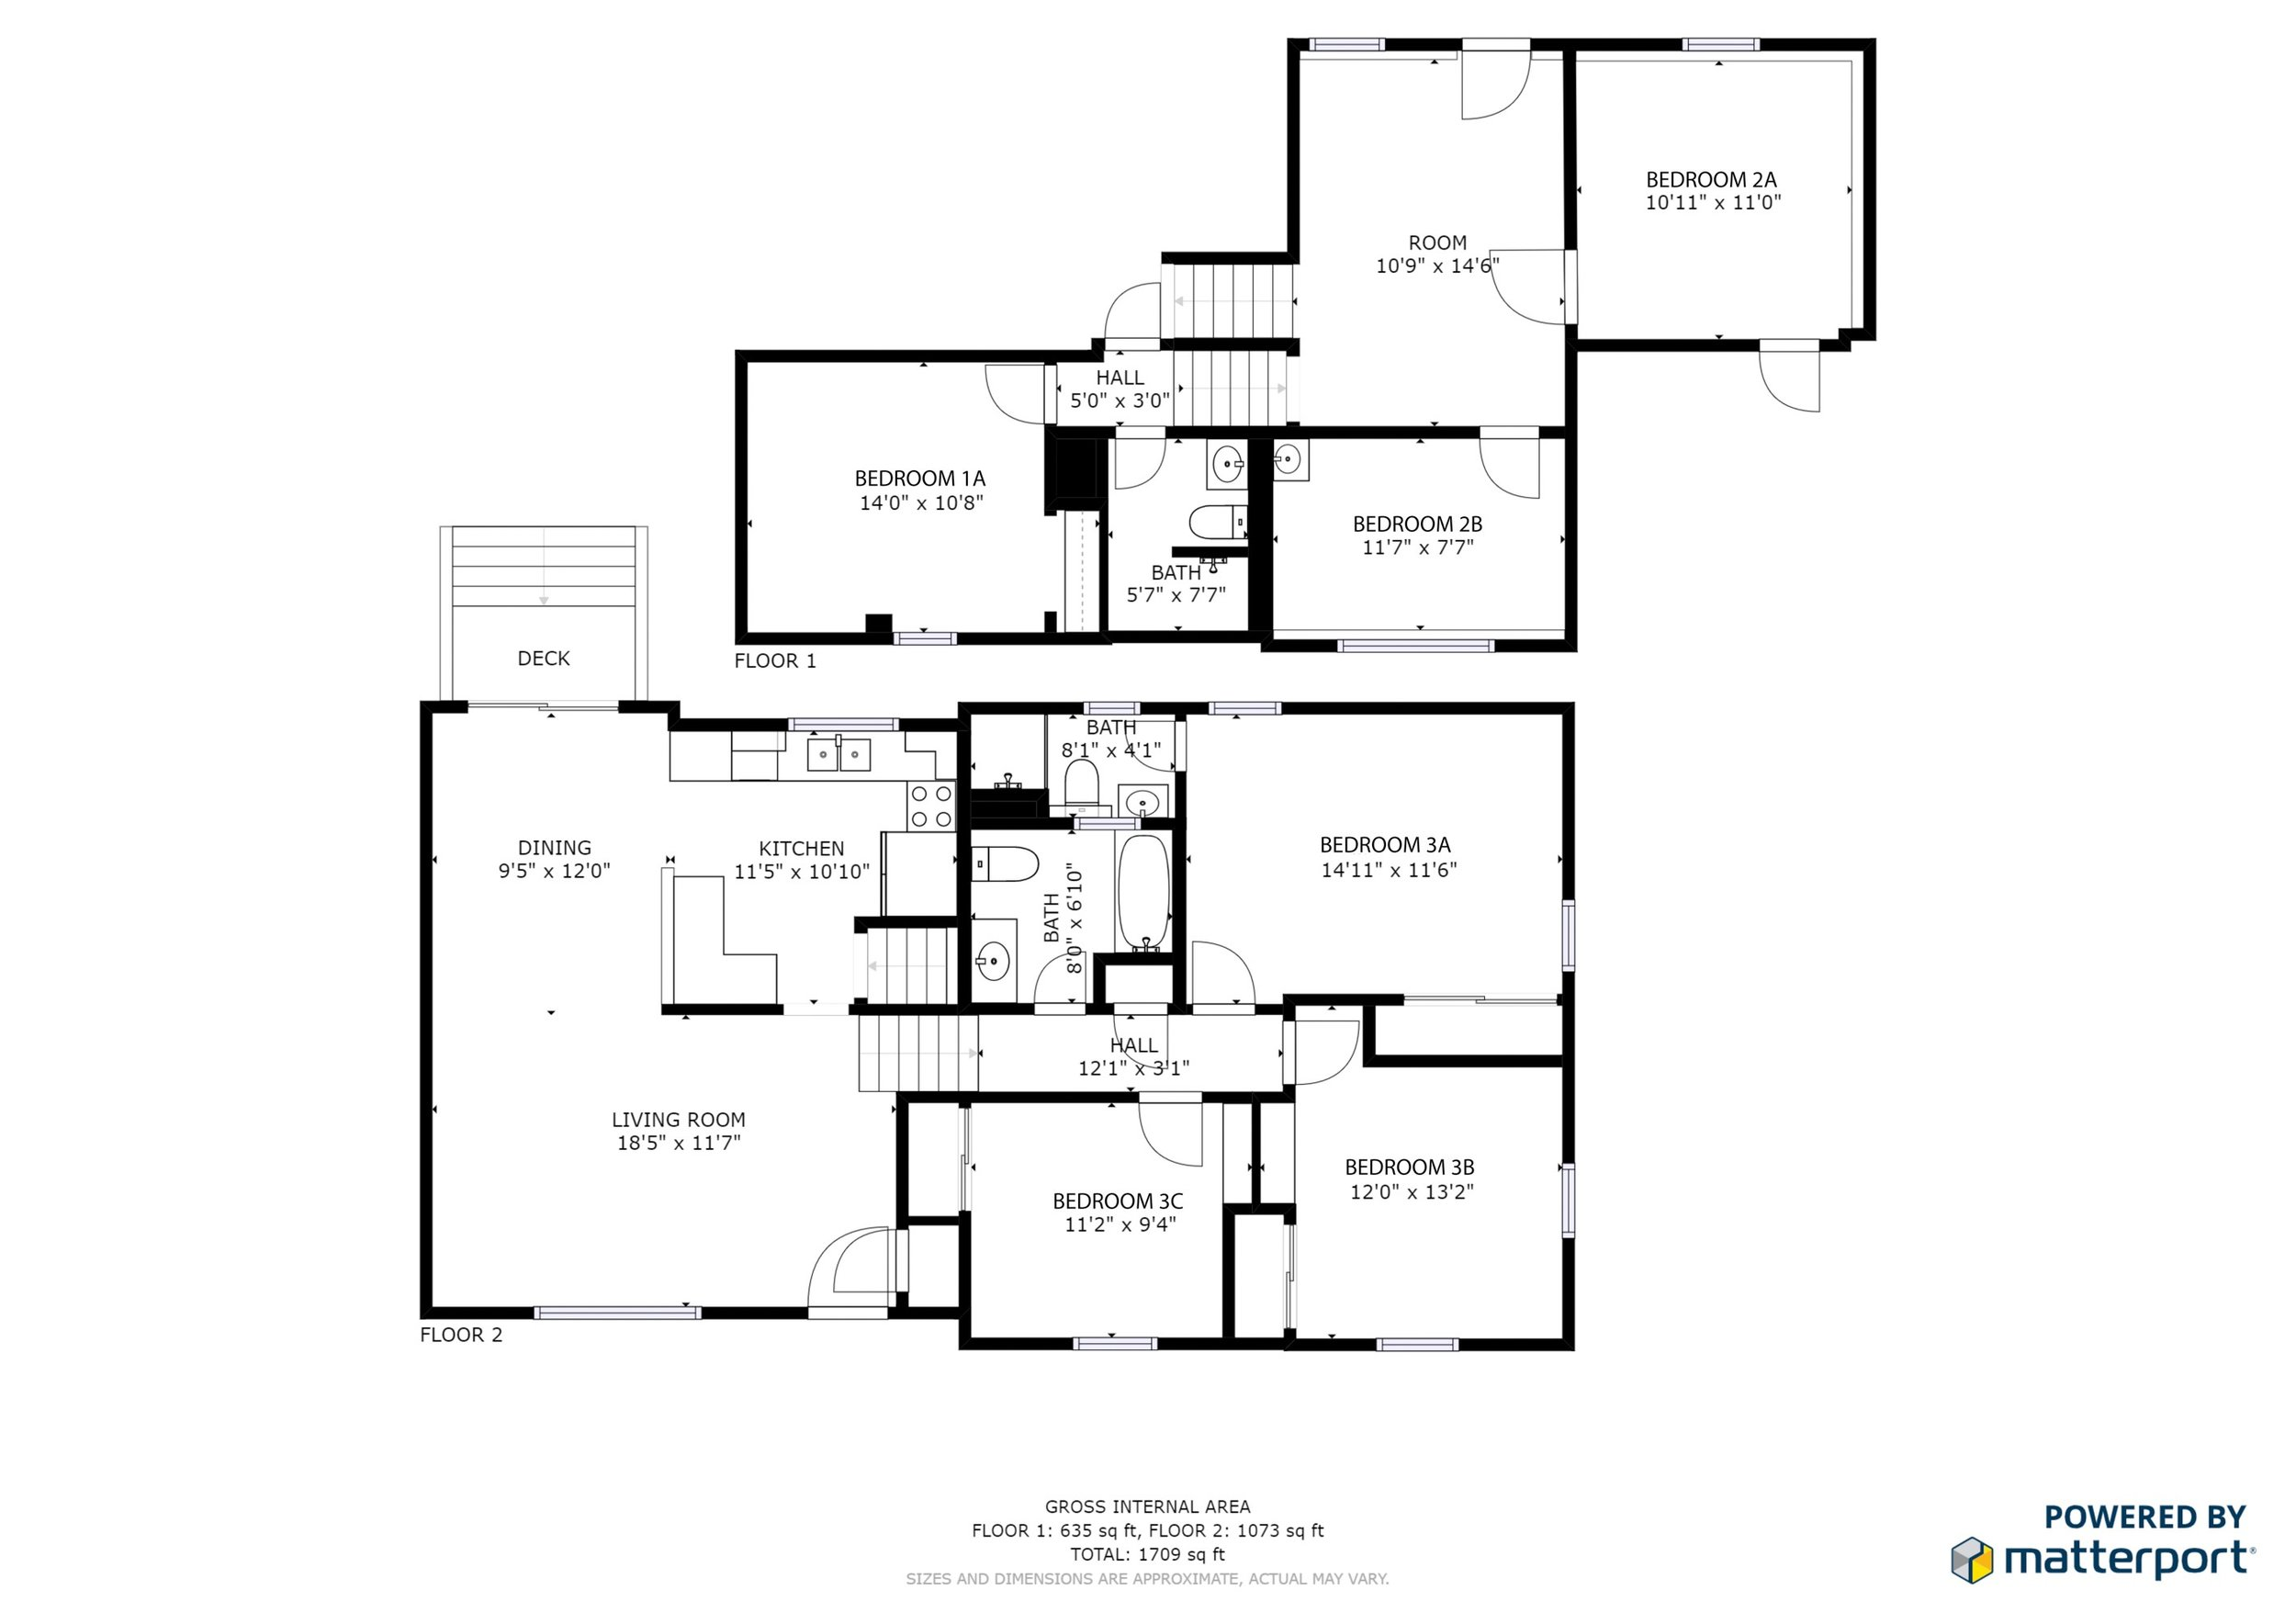 Floor+Plan+With+Room+Labels.jpg